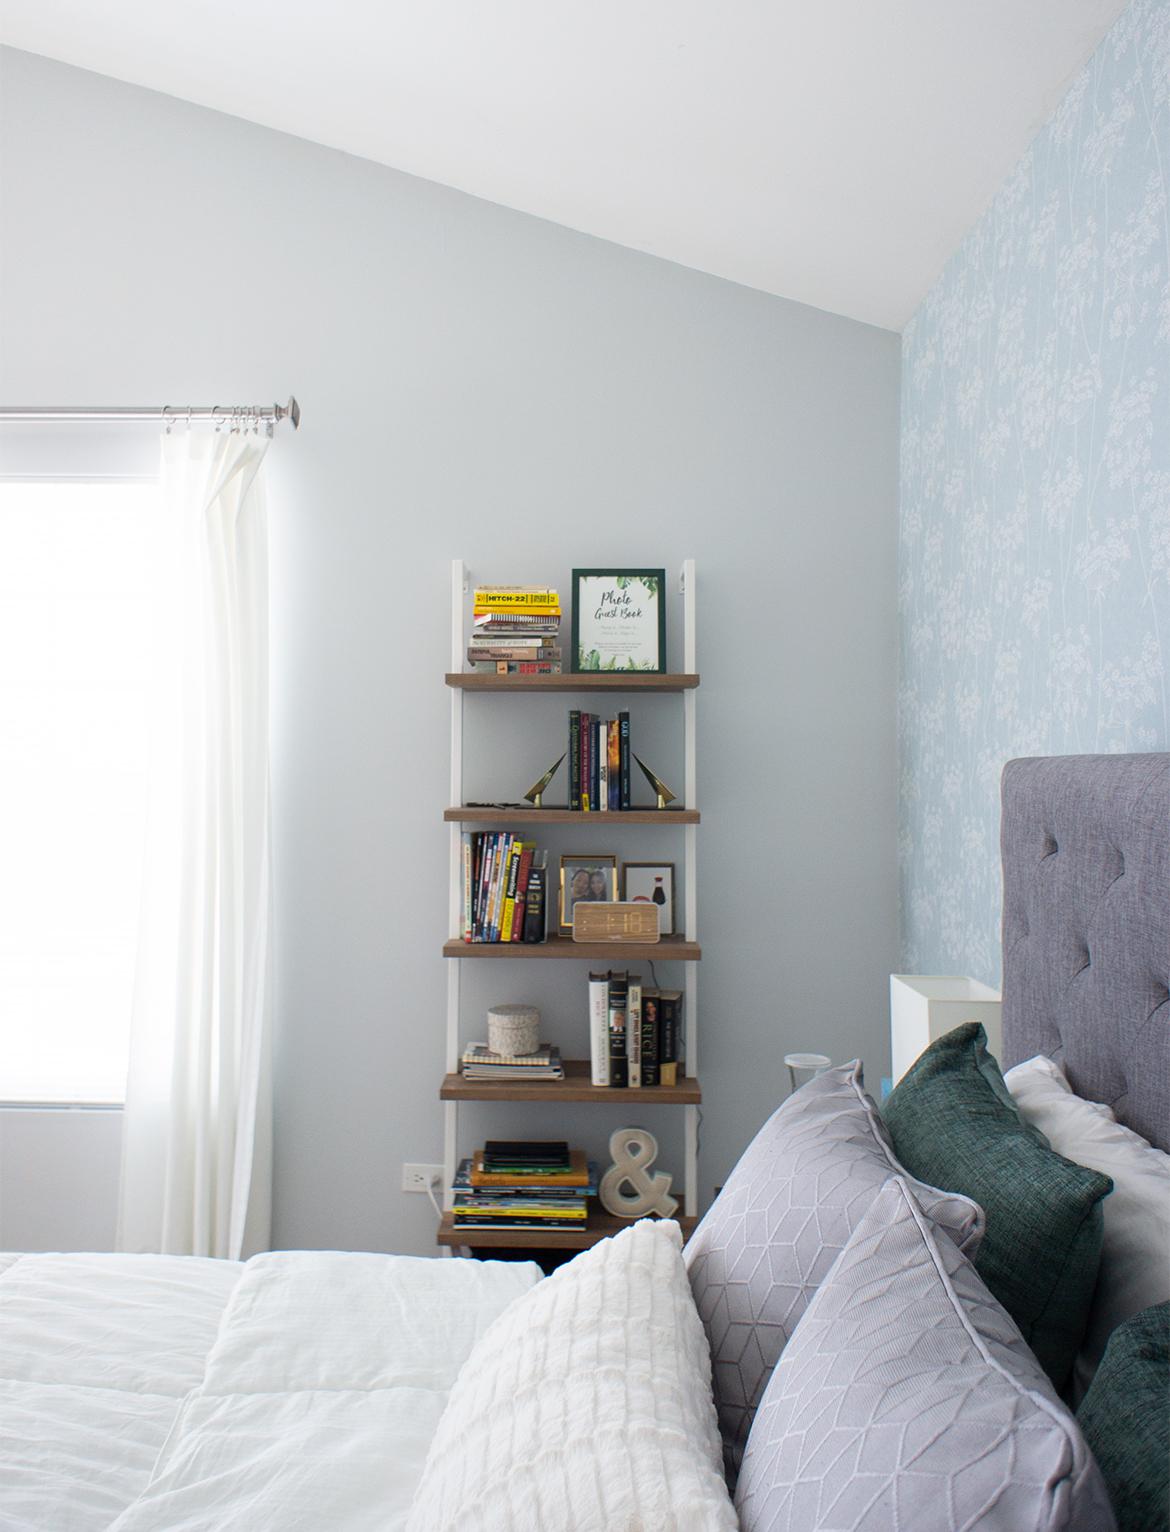 Bookshelf next to bed